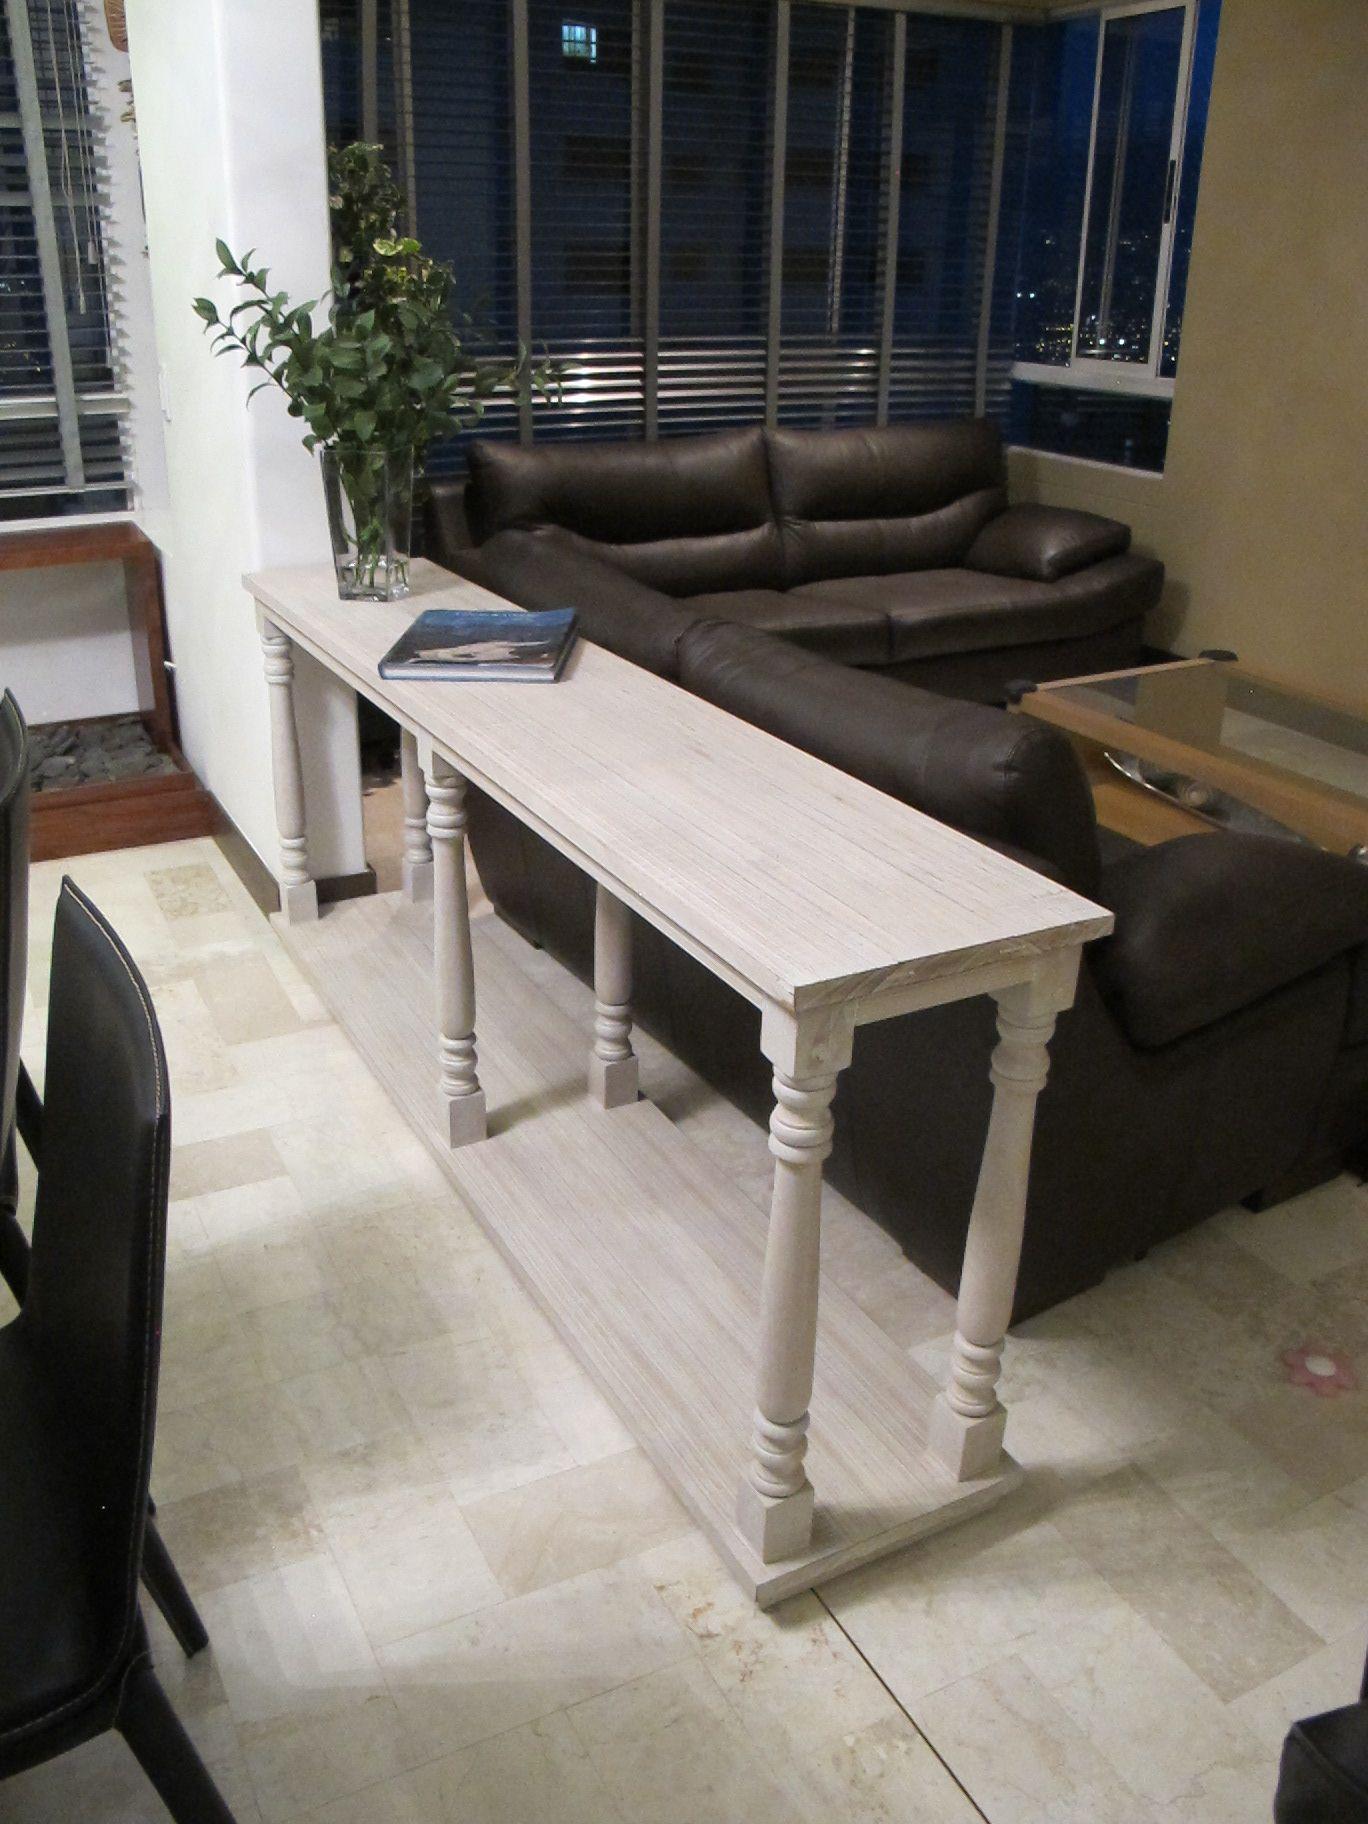 Mueble separador de espacios madera de roble acabado en for Mueble 45 cm ancho